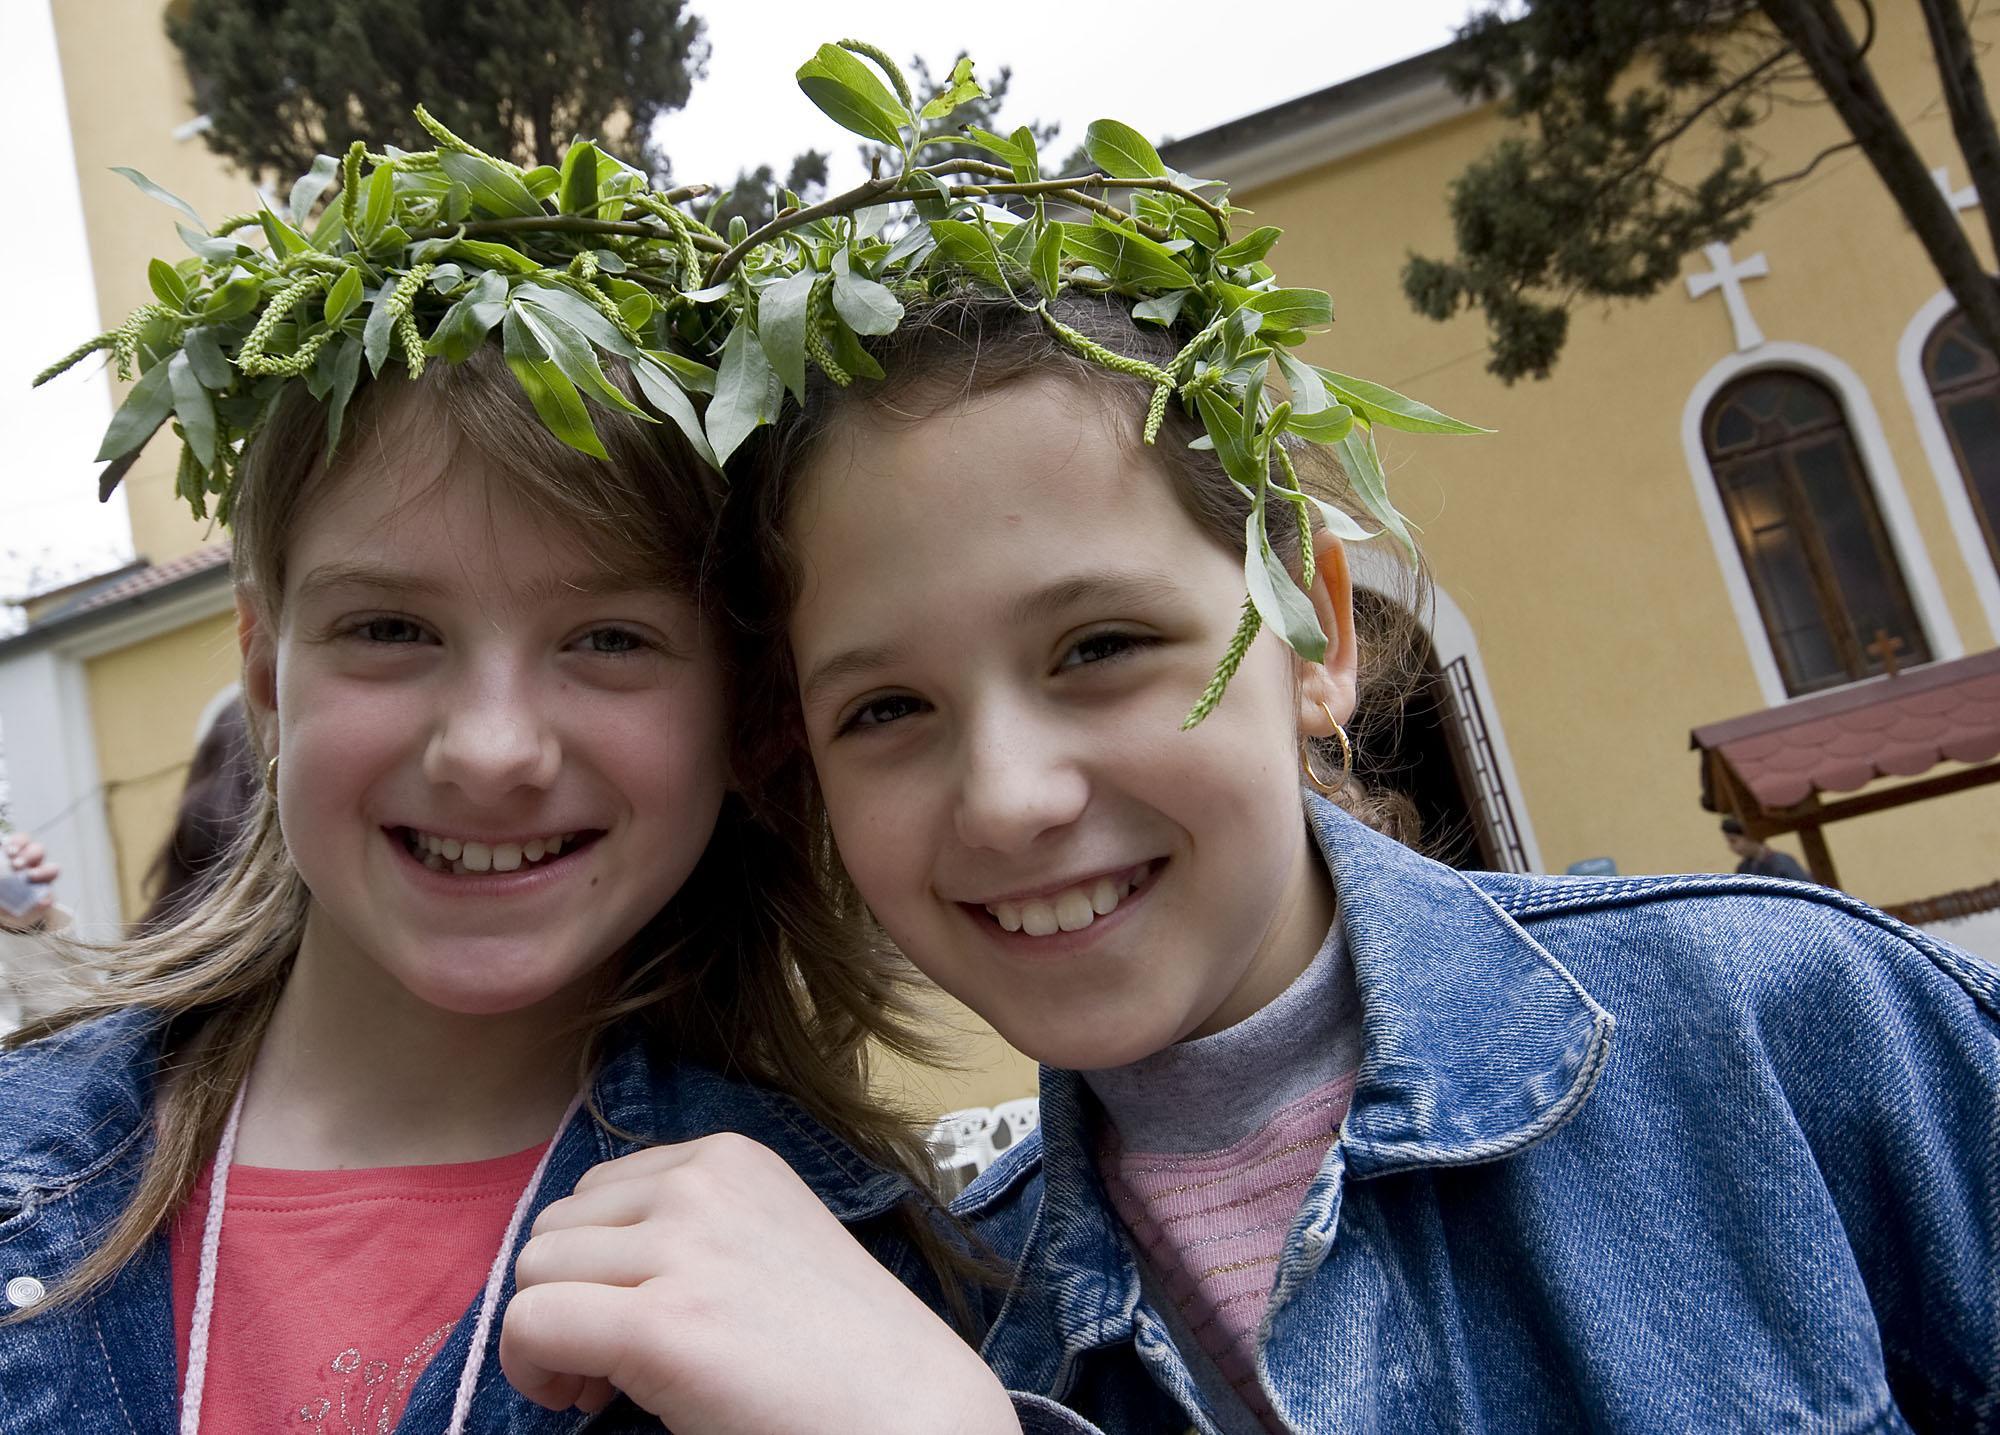 Празнуваме Цветница, а католиците - Великден